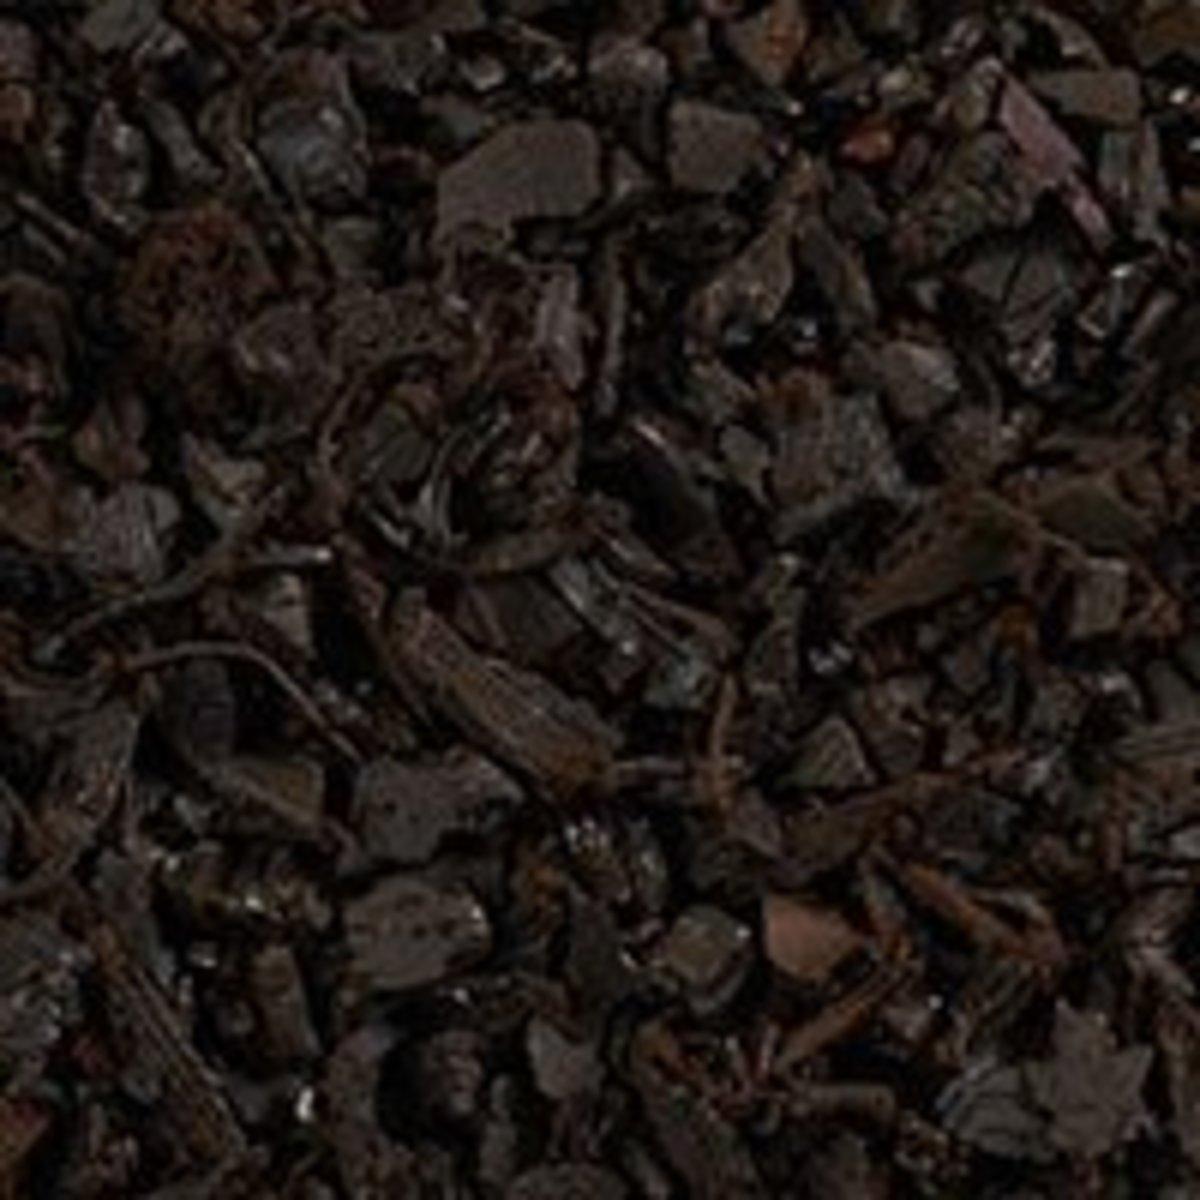 Rubber mulch and bark